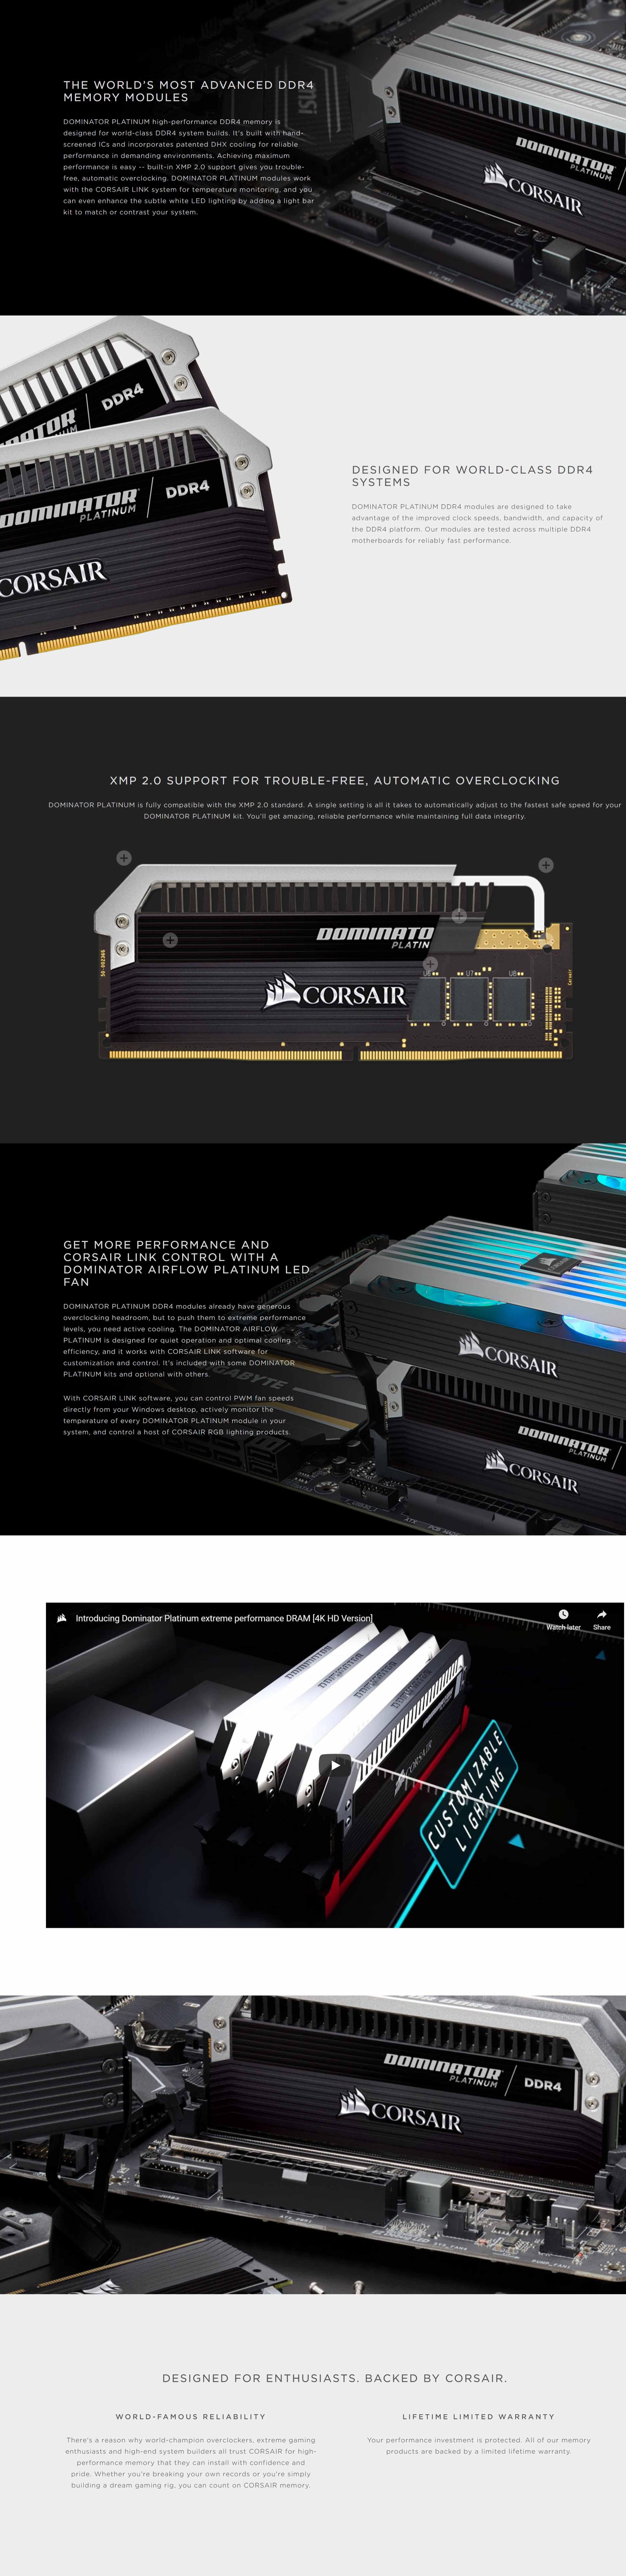 screencapture-corsair-us-en-Categories-Products-Memory-DOMINATOR-PLATINUM-16GB-2-x-8GB-DDR4-DRAM-3200MHz-C16-Memory-Kit-p-CMD16GX4M2B3200C16-2020-04-27-1.jpg